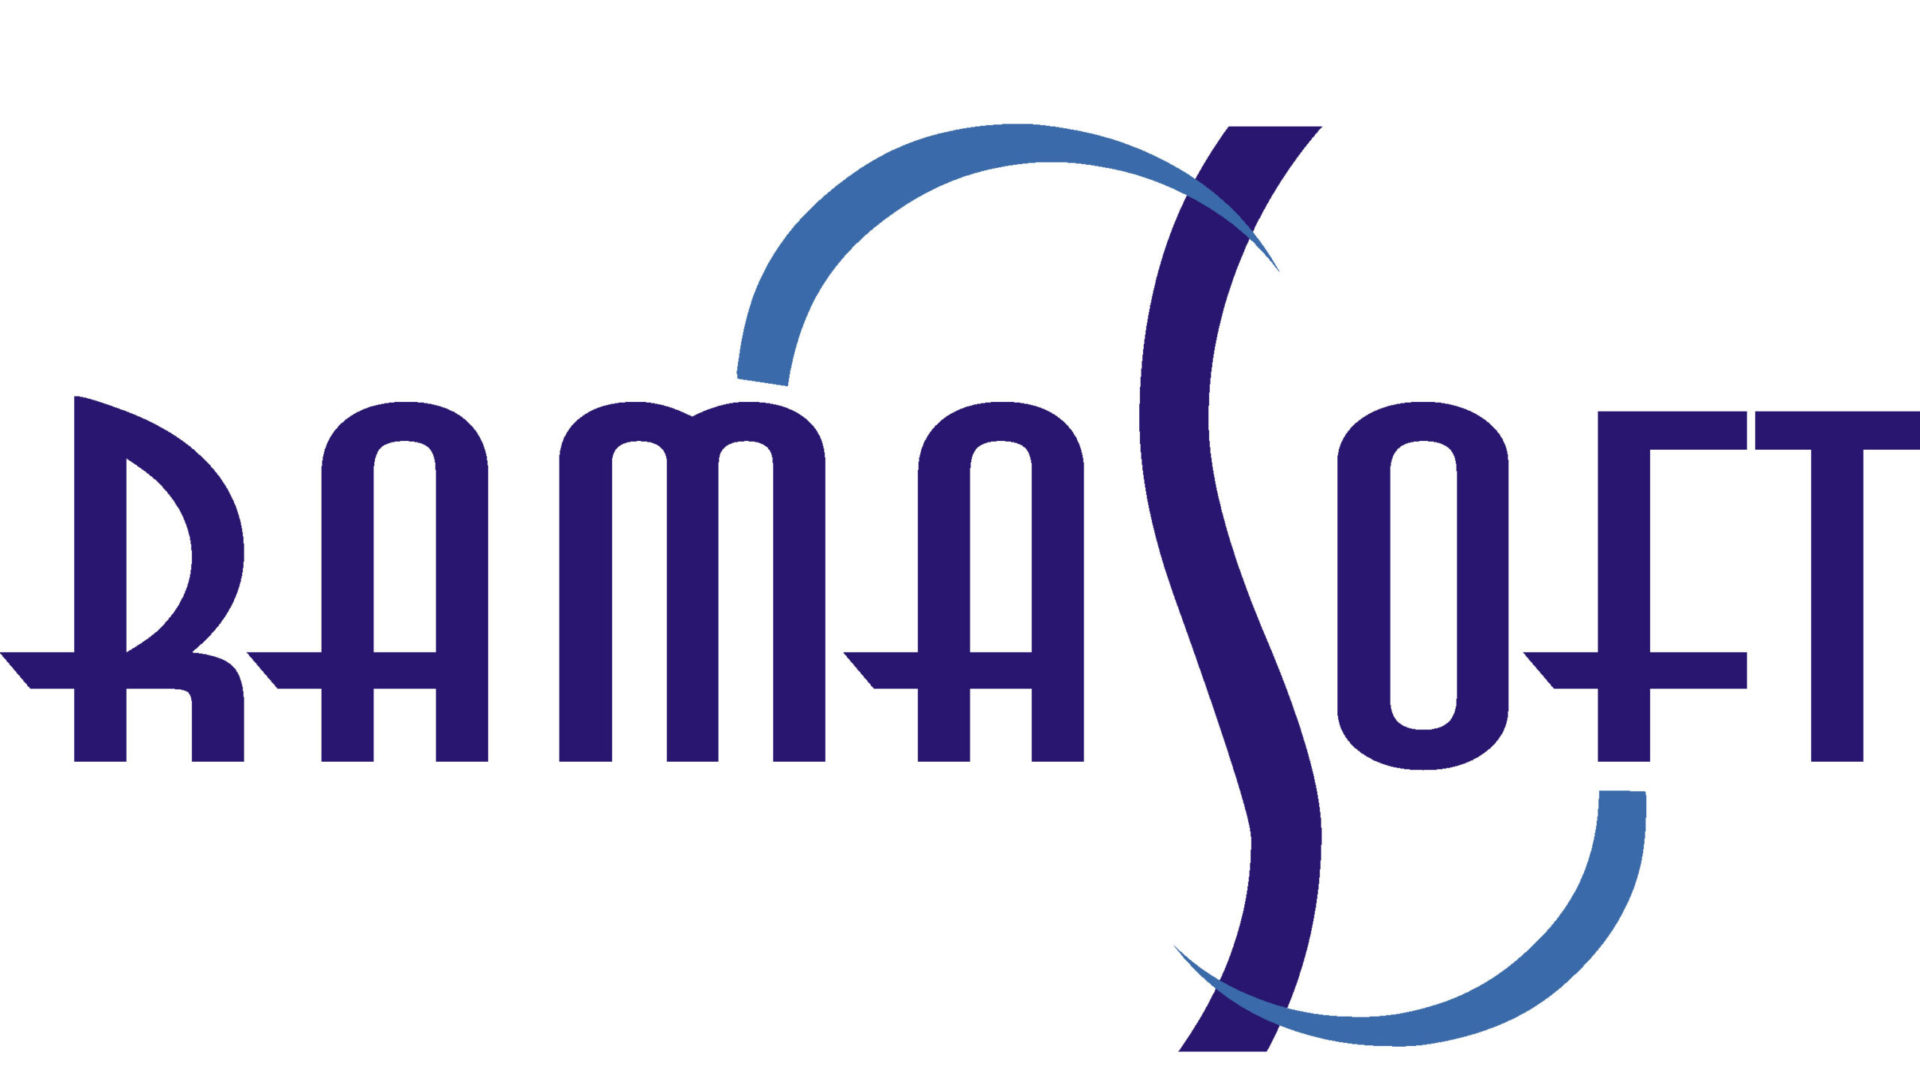 Ramasoft csoport